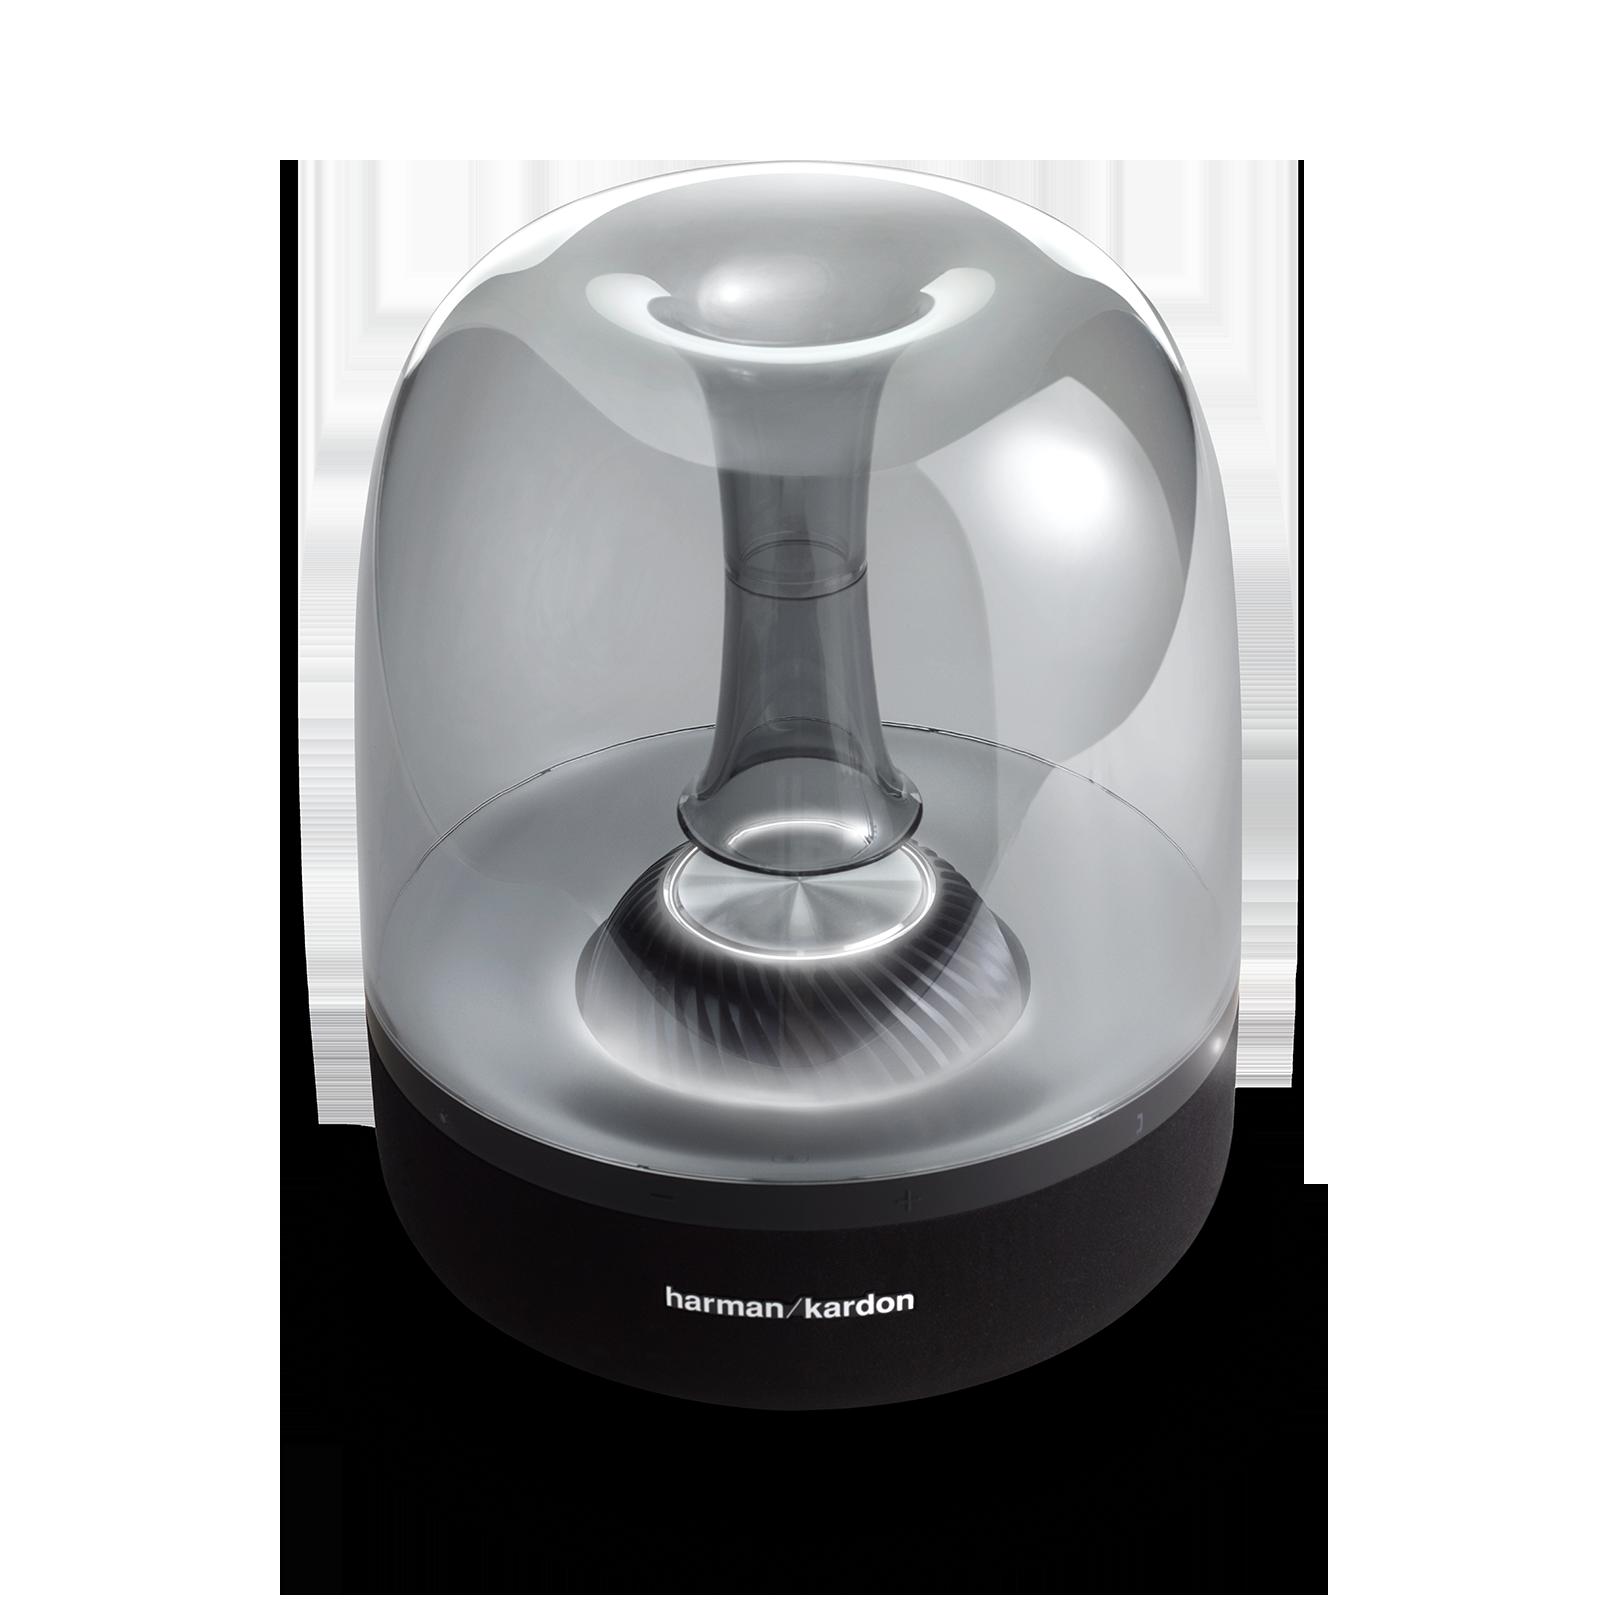 AURA STUDIO 2 - Black - Wireless speaker with ambient lighting - Detailshot 3